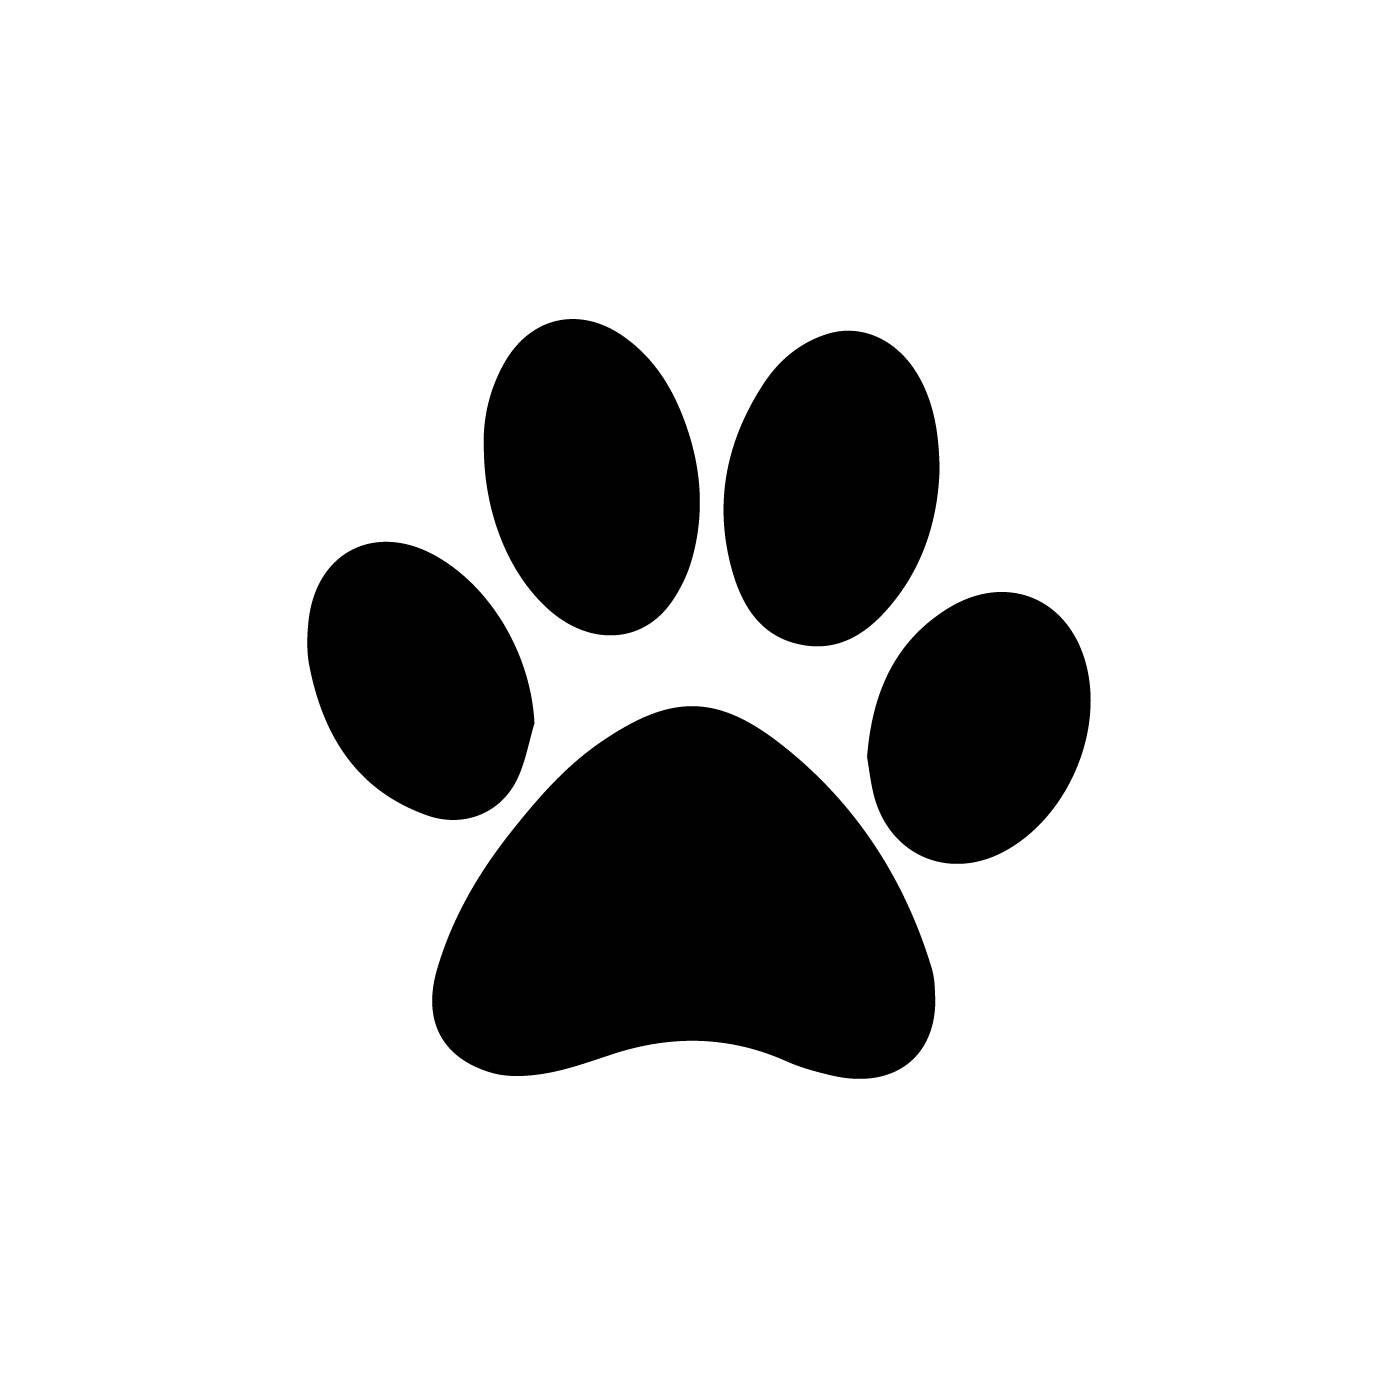 Download Paw Monogram Svg, Paw Print Svg, Dog Svg, Paw by JoyfulSVG ...